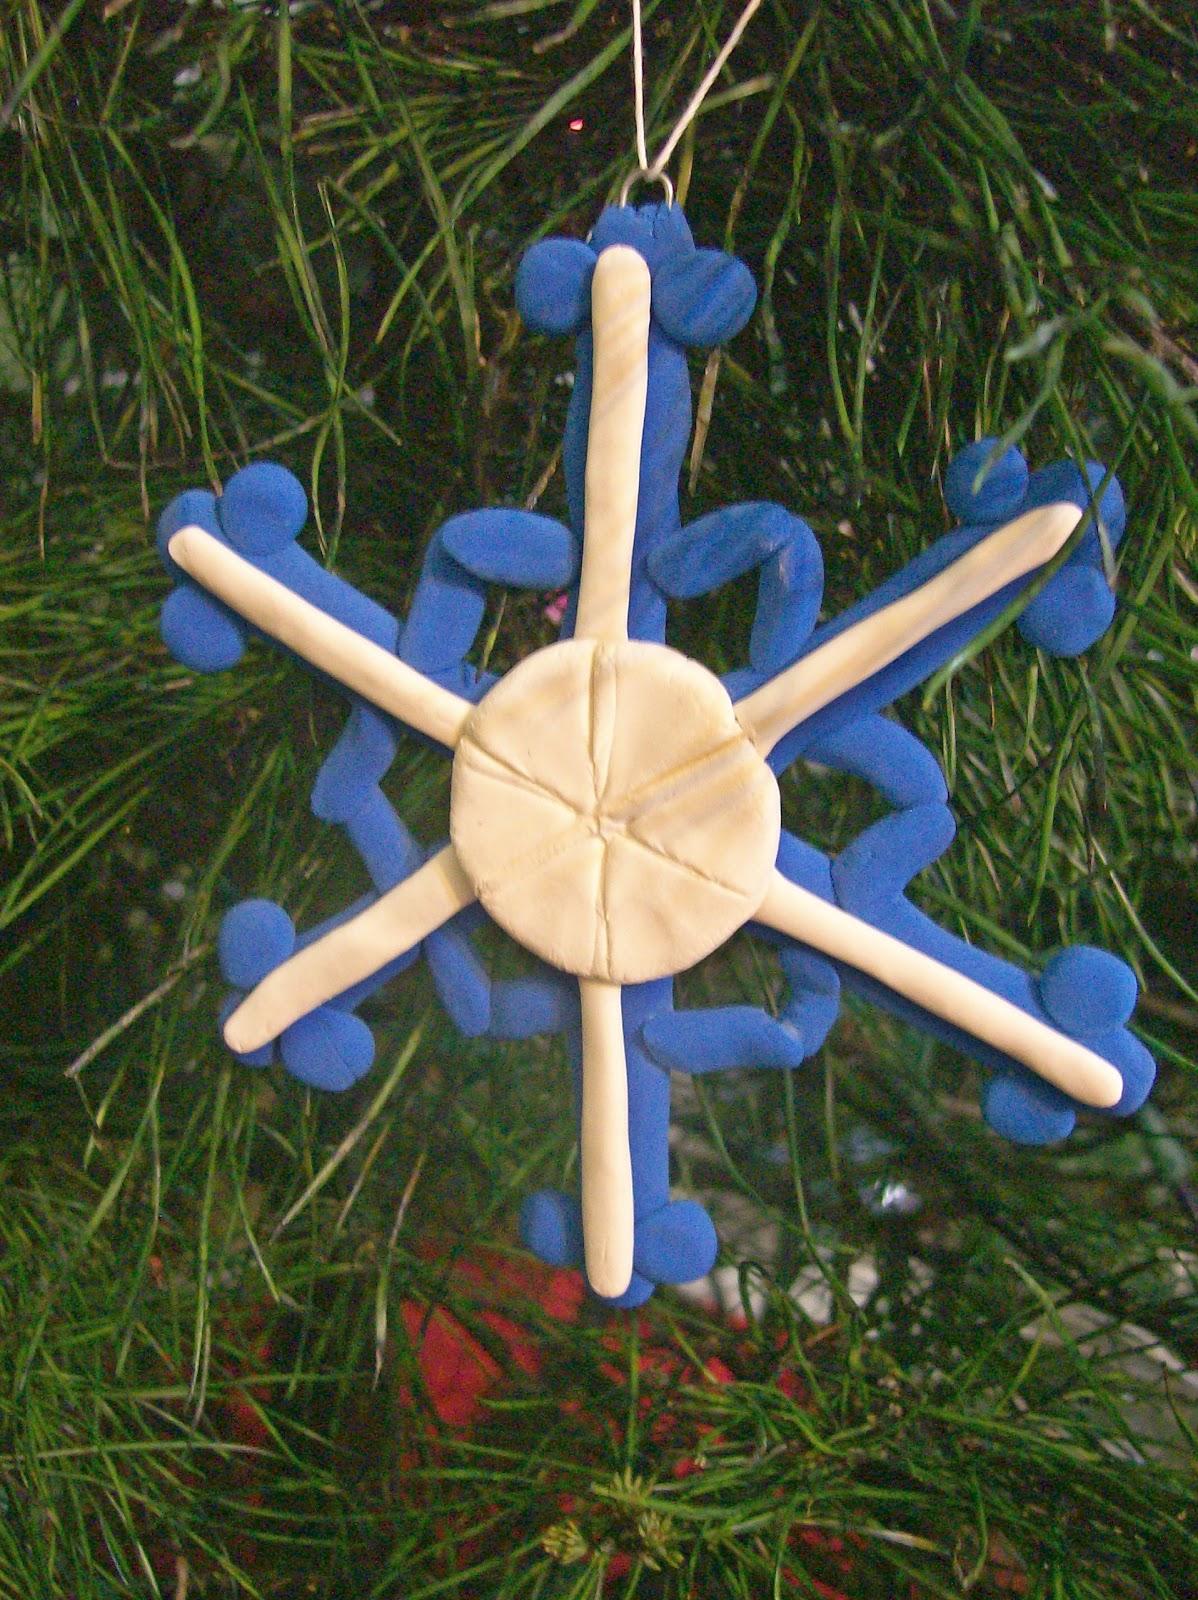 Snowflake Christmas ornament in Crayola Model Magic made by April Garwood of Banana Moon Studio